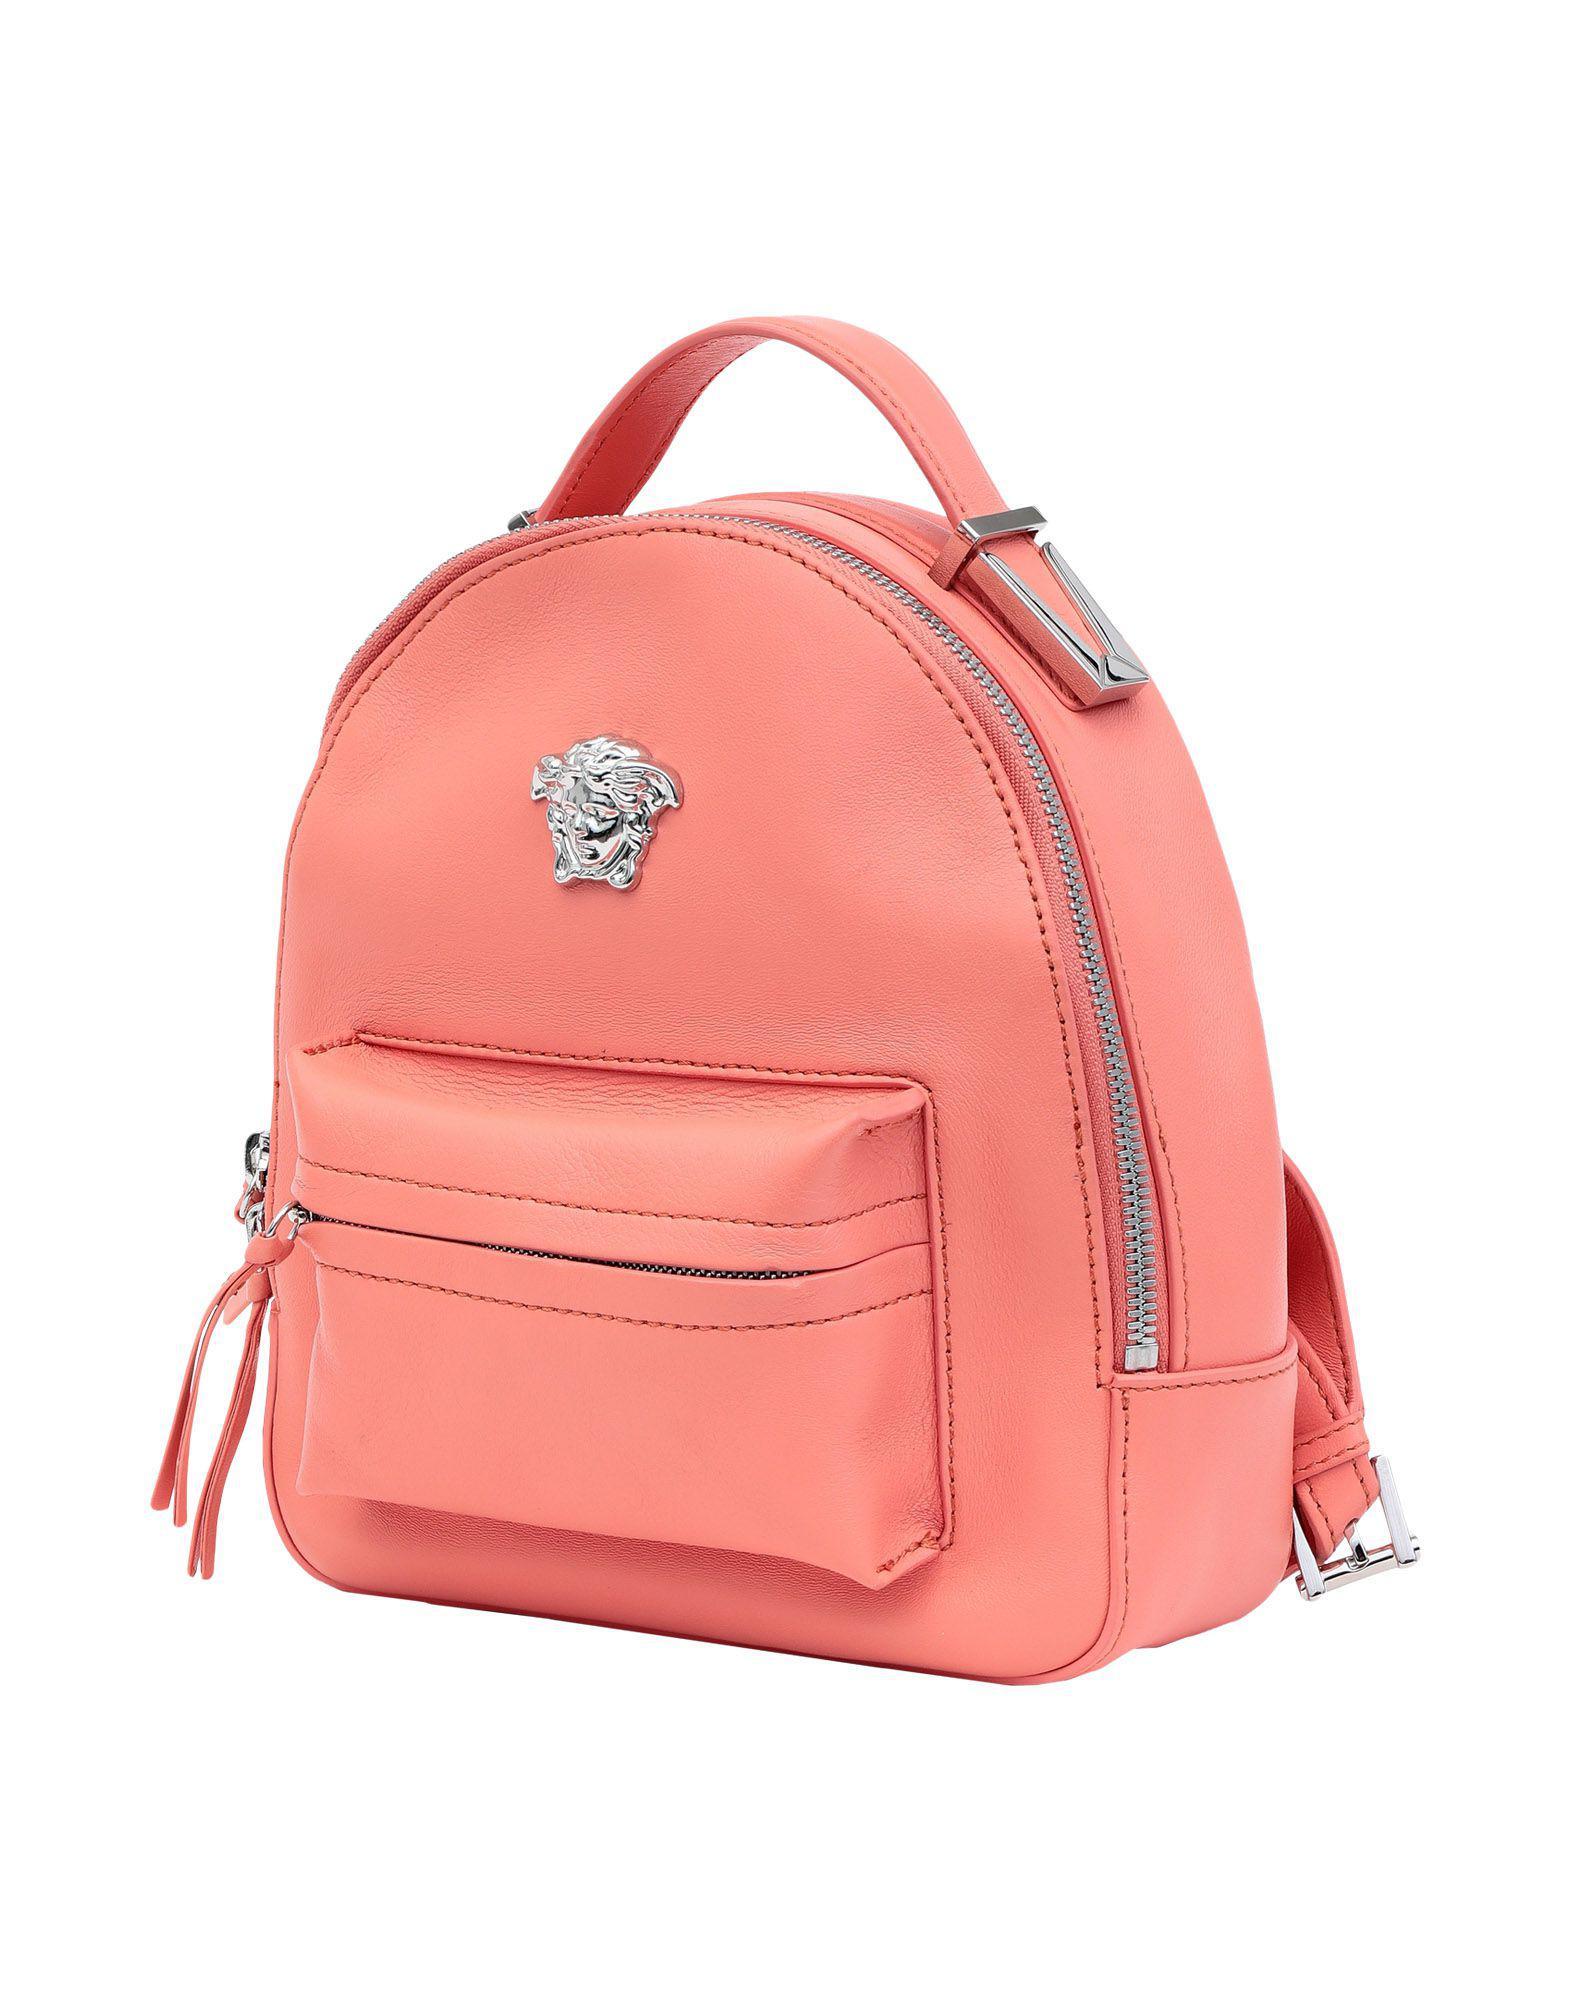 7aa7ec1fdf Lyst - Versace Backpacks   Bum Bags in Pink